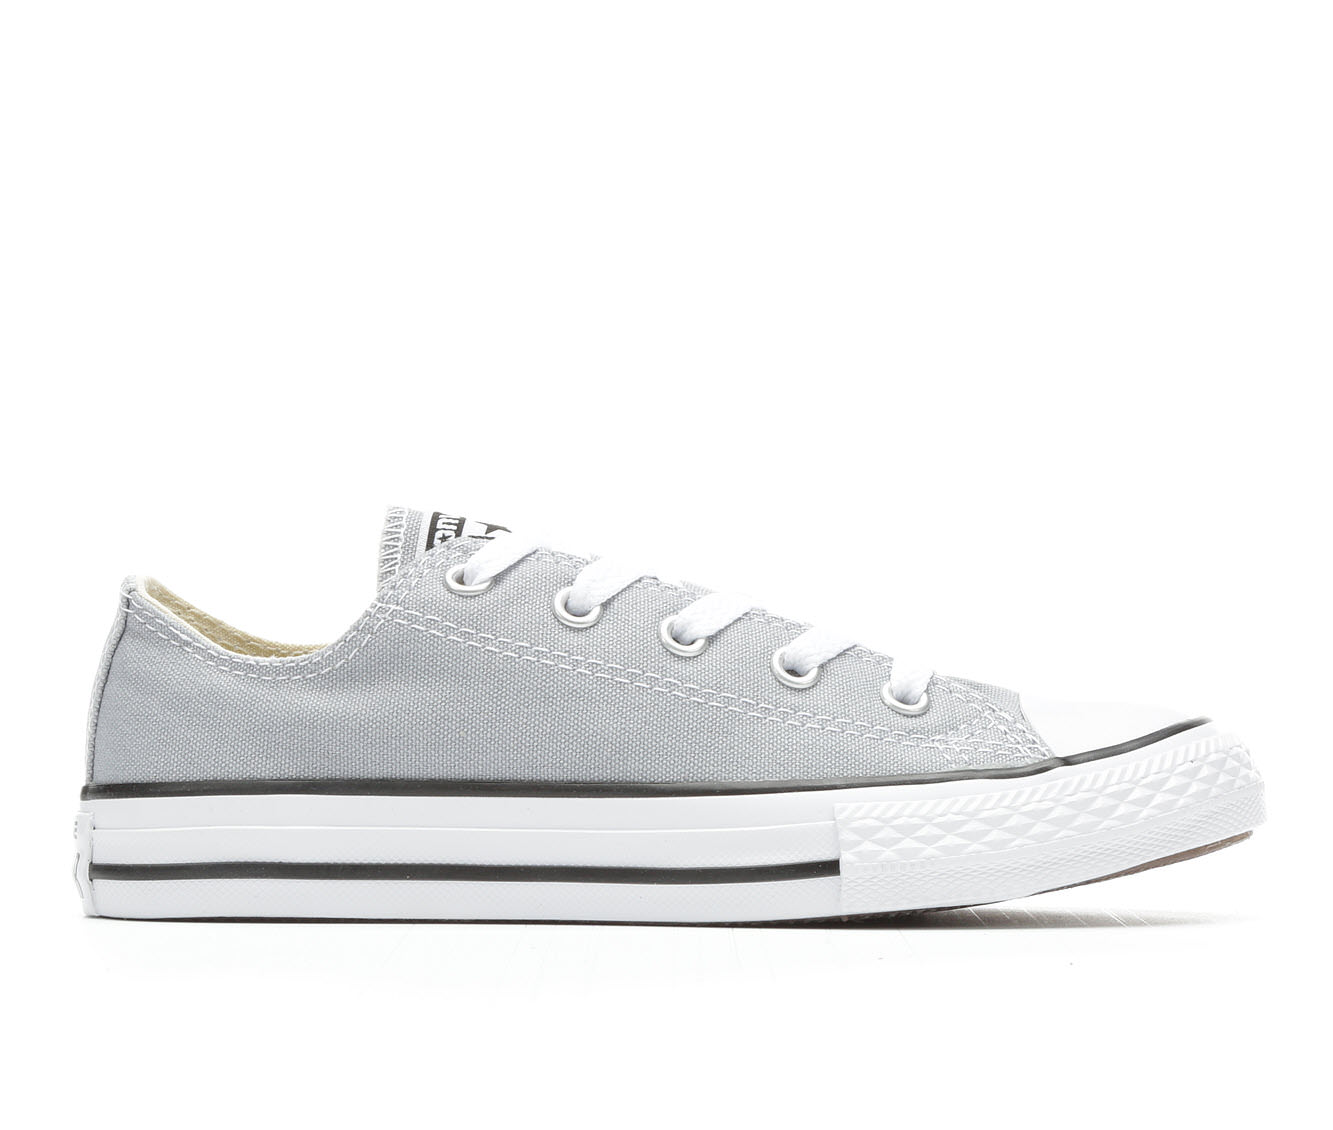 Girls' Converse Chuck Taylor All Star Seasonal Sneakers (Grey)